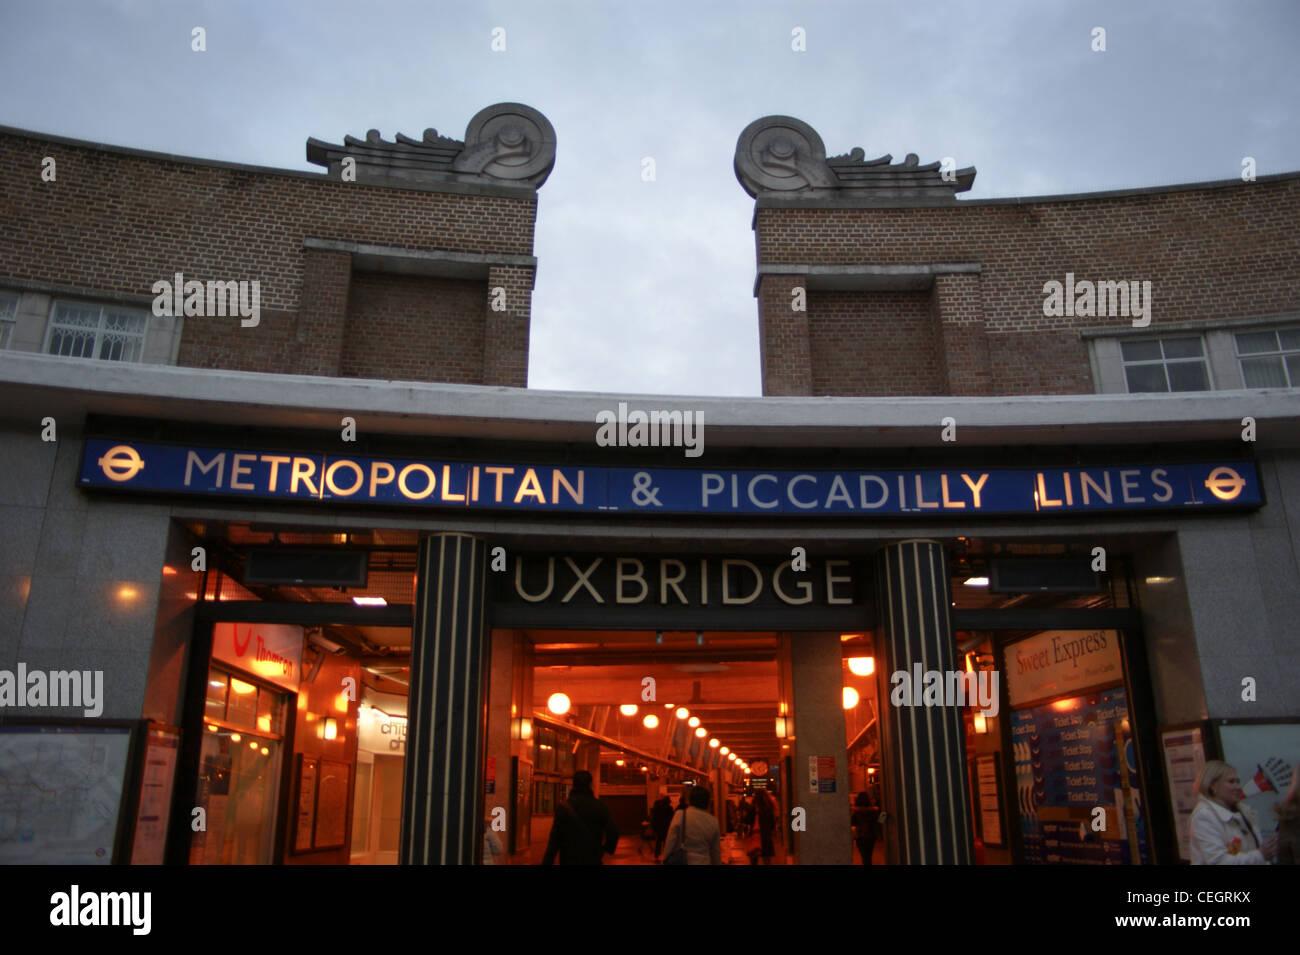 Art Deco exterior of Uxbridge Underground (Tube) station on the Metropolitan Line,  Middlesex, London, England, - Stock Image